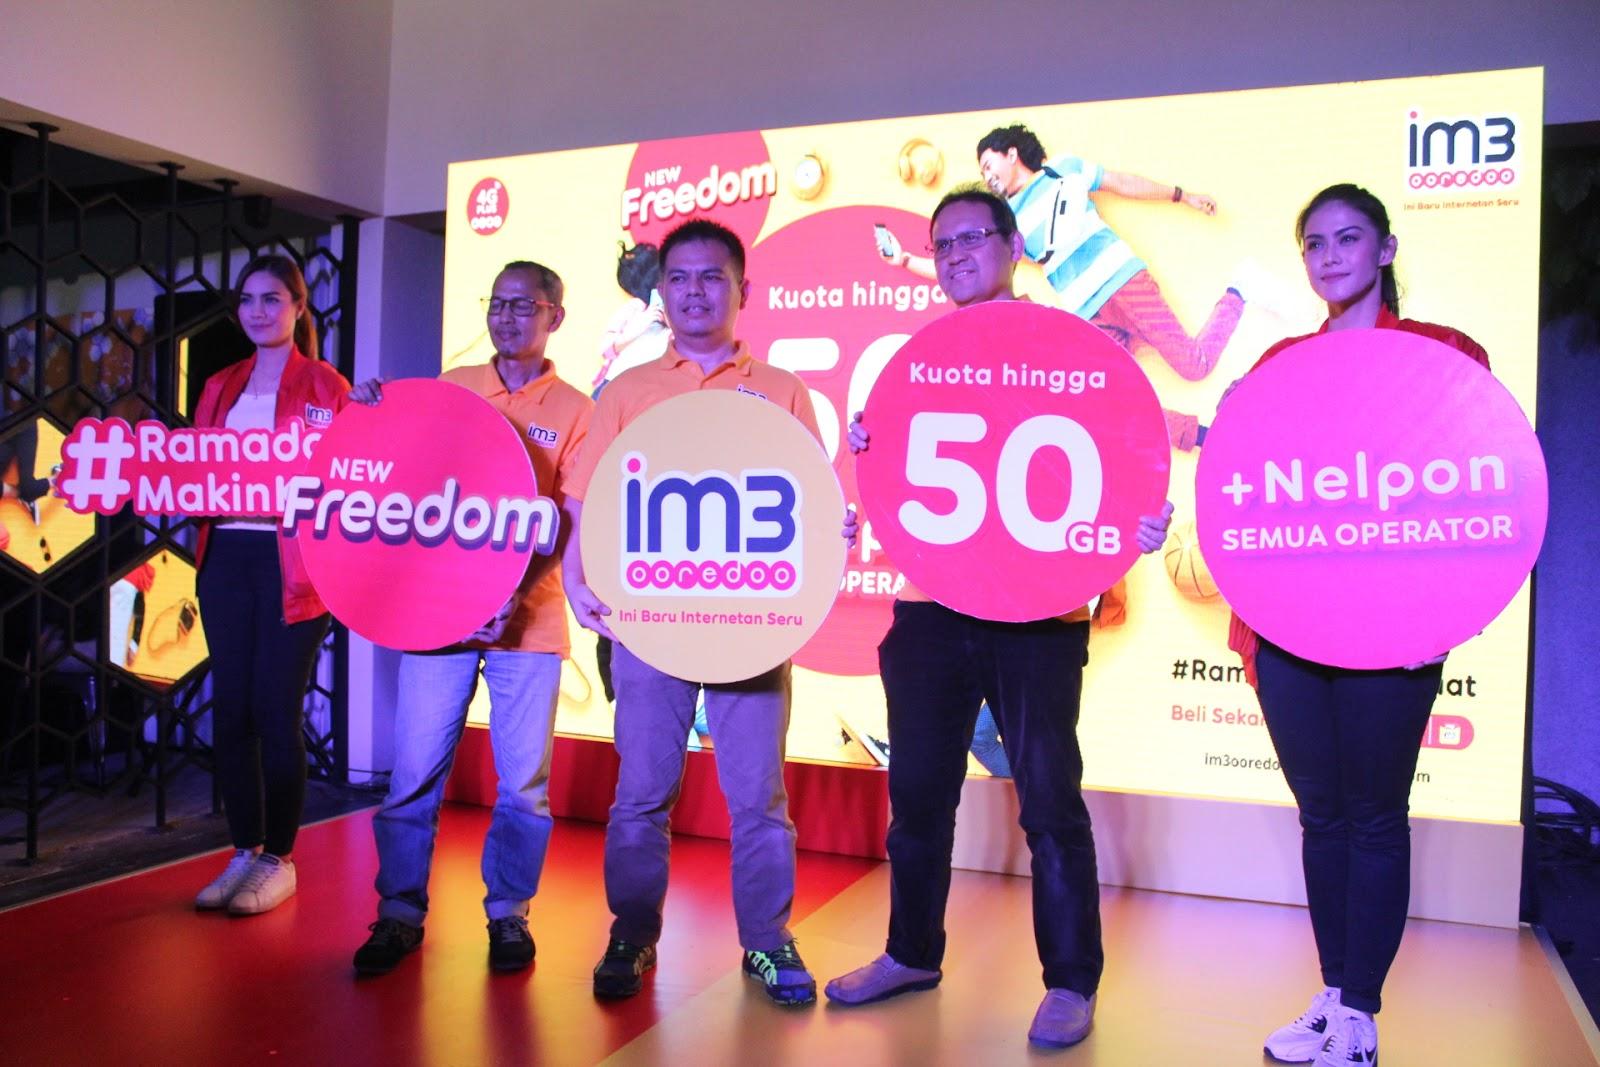 Paket New Freedom IM3 Ooredoo, Kuota Internet Besar dan Gratis Nelpon ke Semua Operator